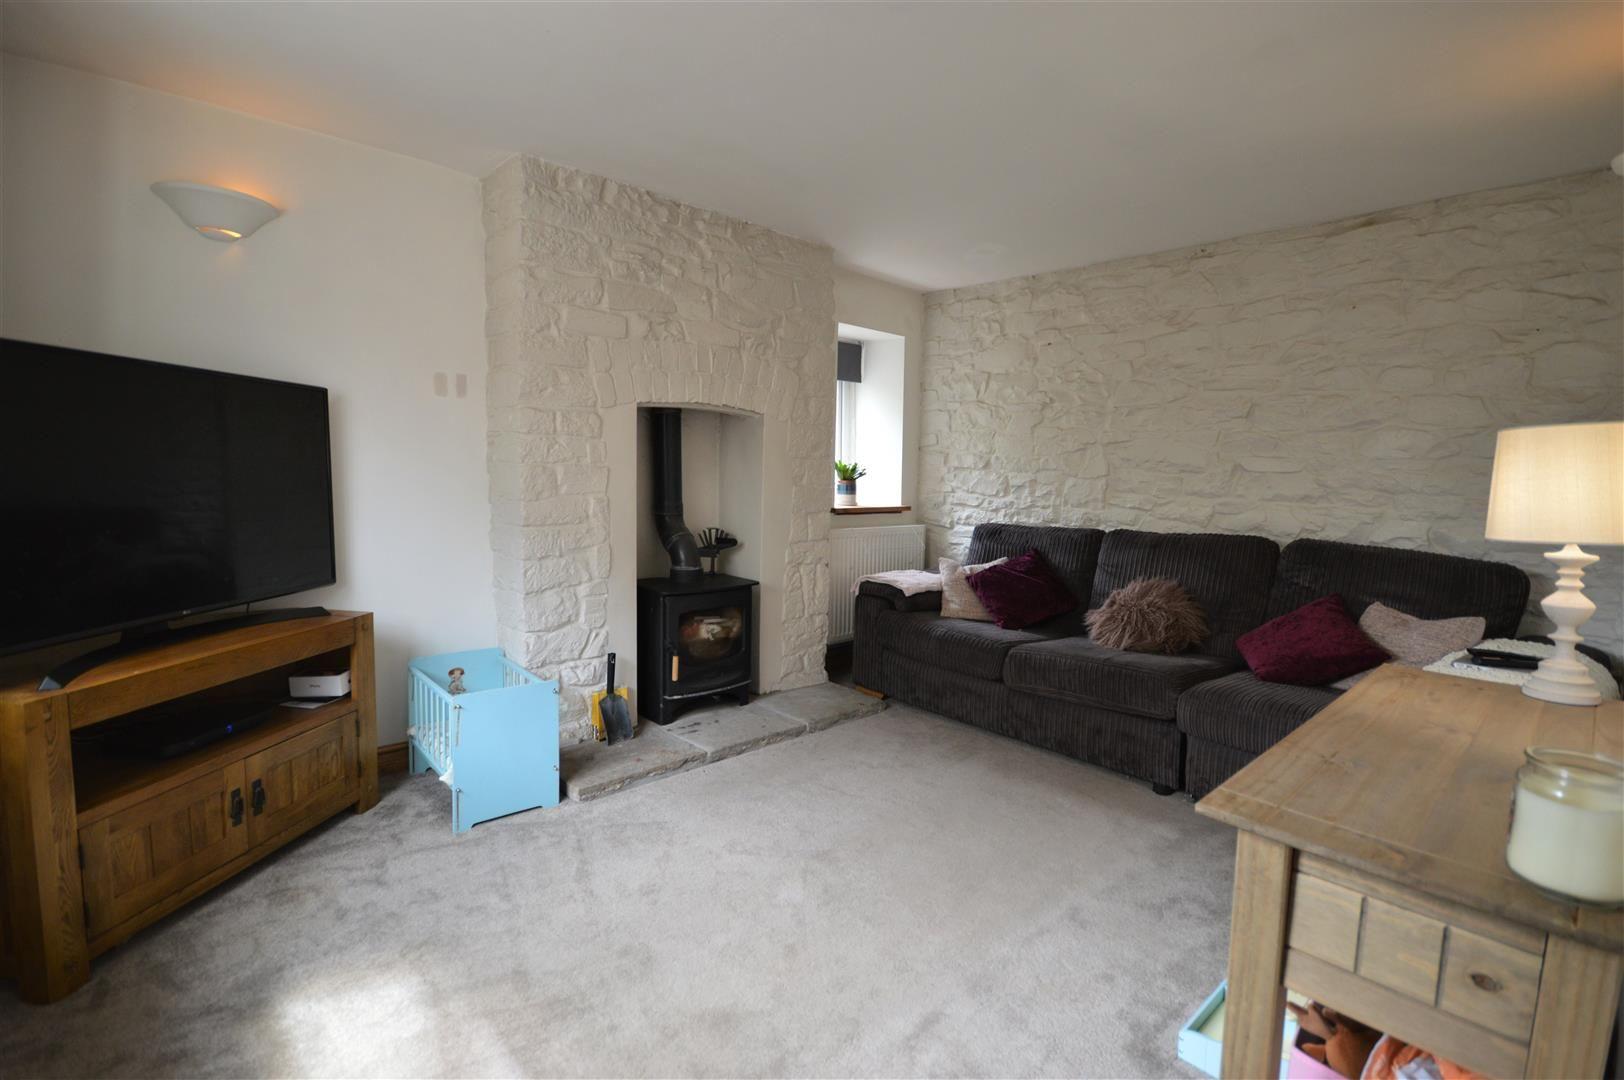 2 bed detached for sale in Kington  - Property Image 4